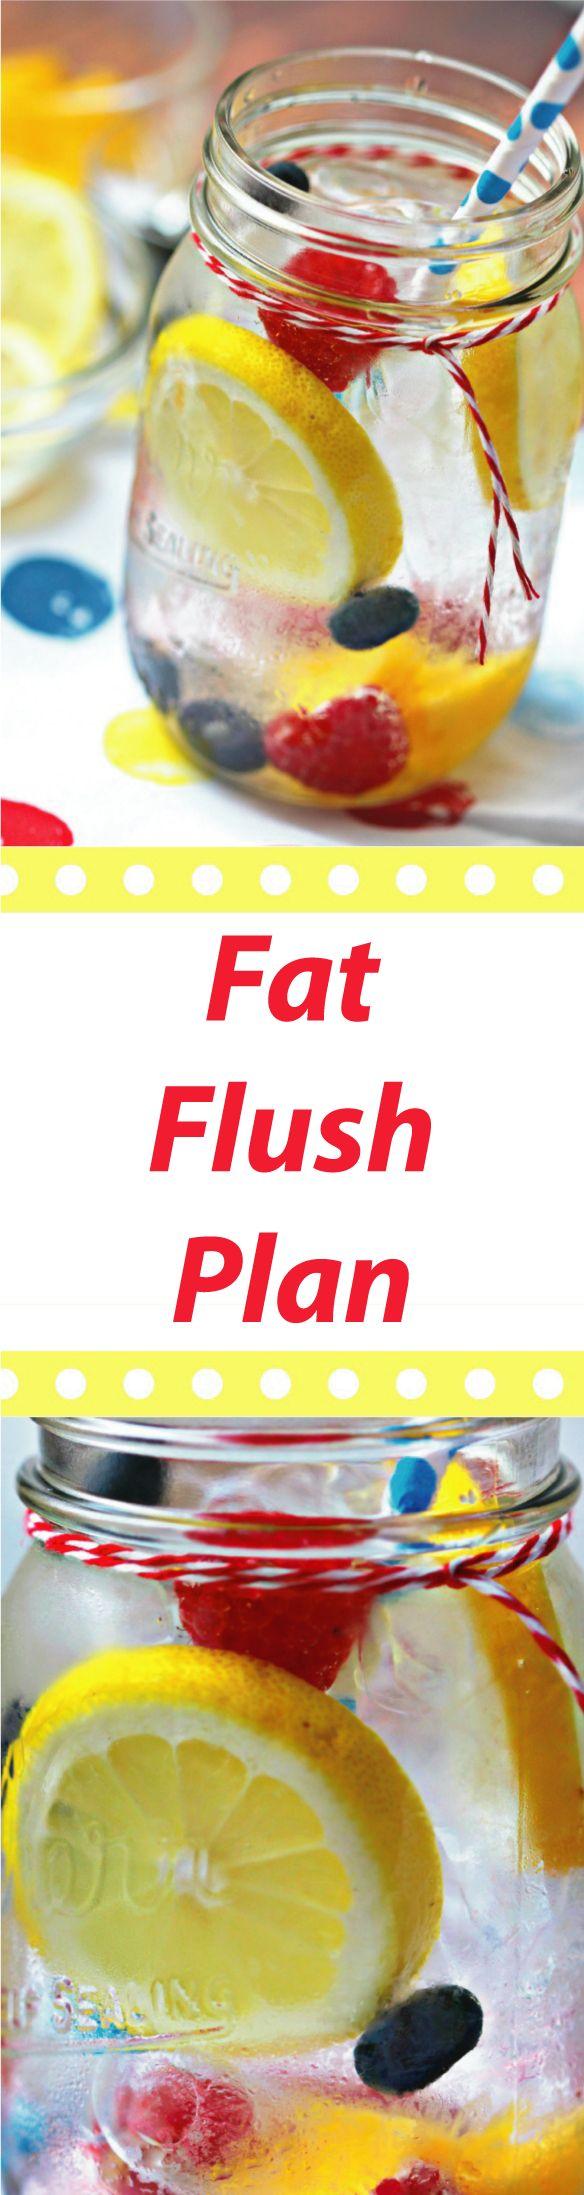 Herbal prescription weight loss pills qnexa reviews product JetFuel Superburn